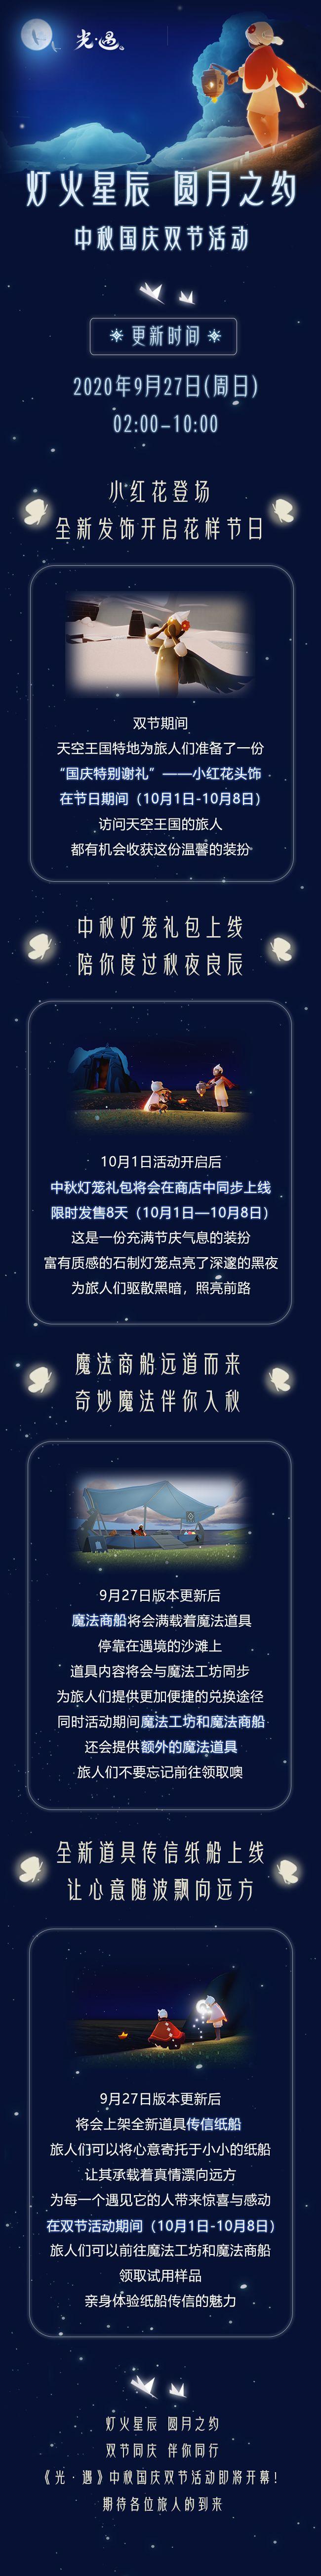 sky光遇9月27日复刻先祖介绍 光遇9.27中秋国庆双节复刻活动内容一览